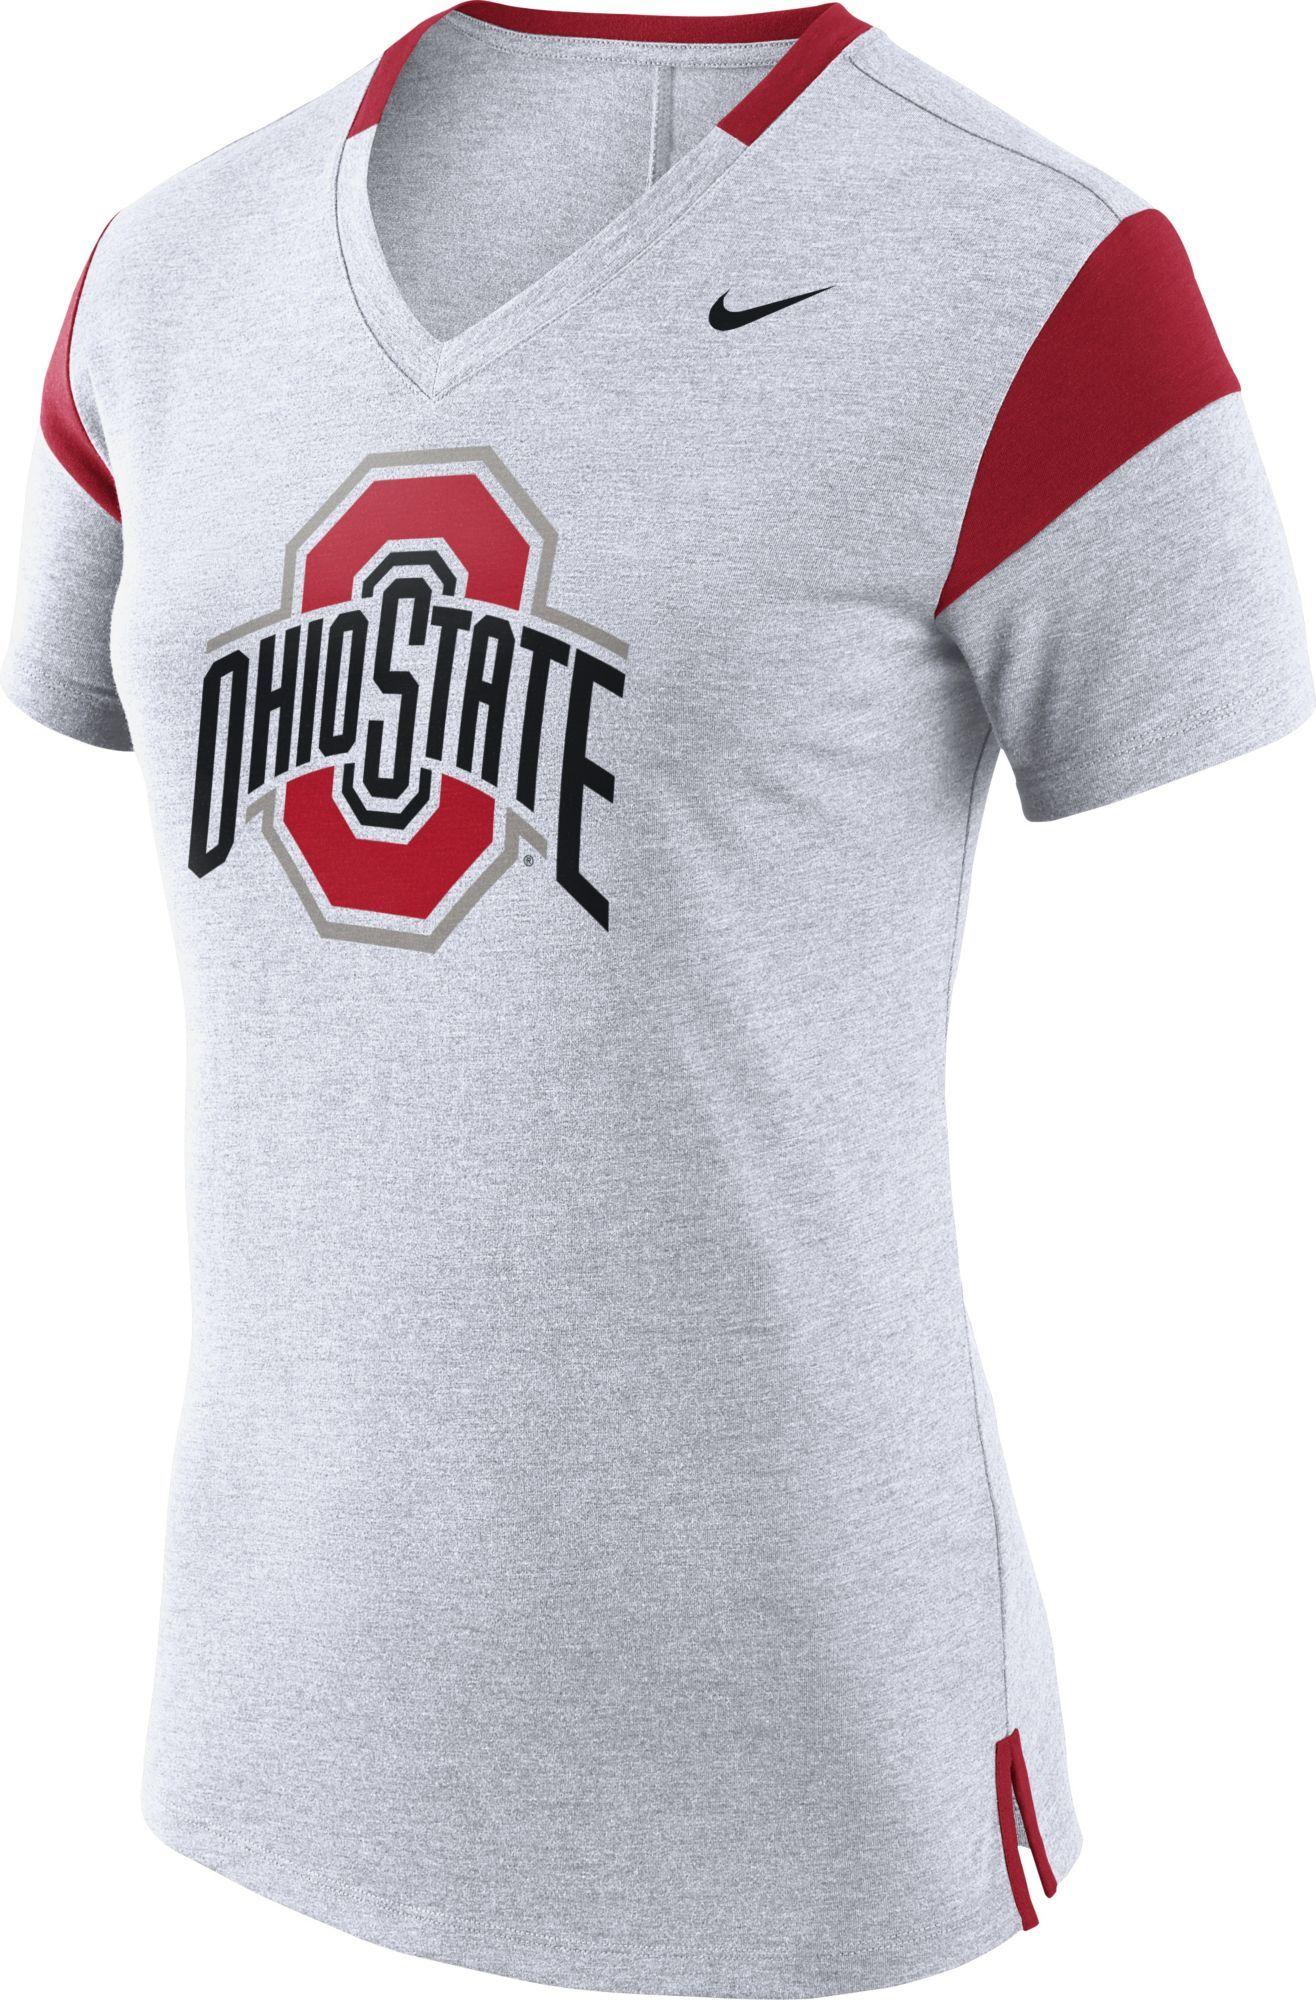 Activewear Clothing, Shoes & Accessories Nike Shirt Mens Size Large Ohio State University Buckeye Nation Drifit